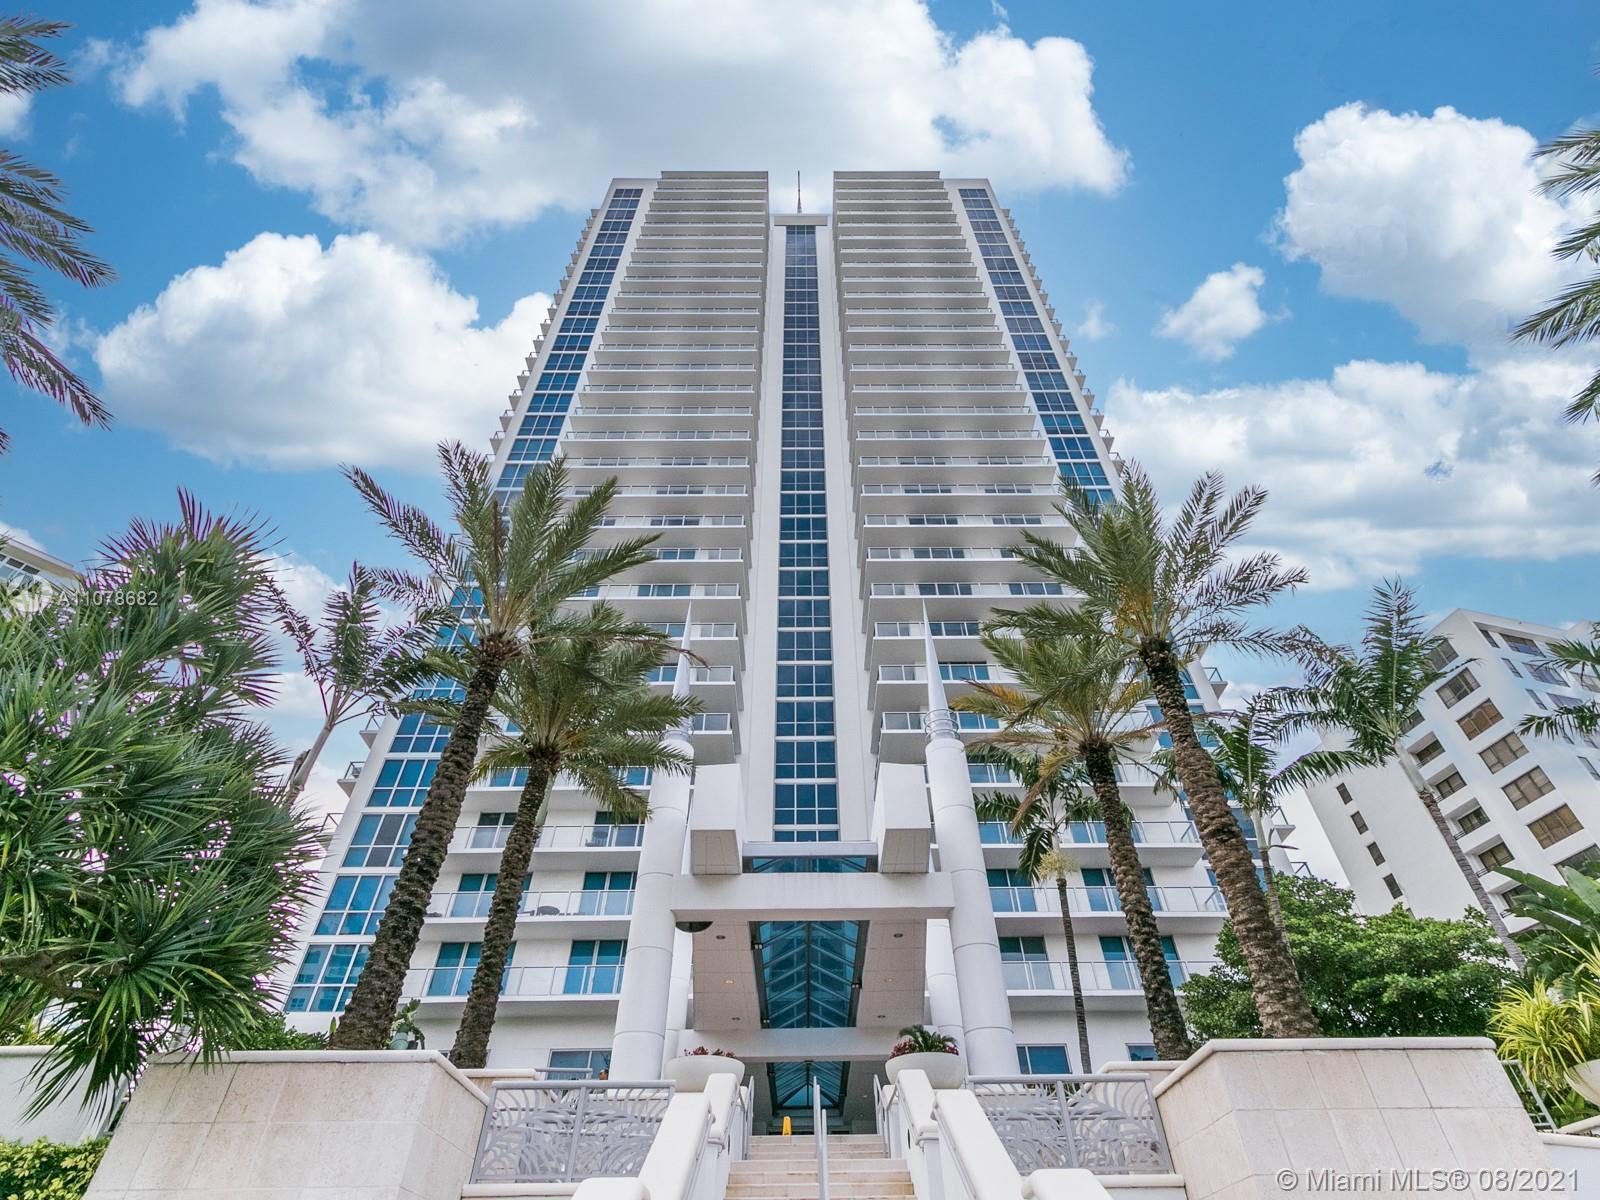 3101 Ocean Dr Unit 1707, Hollywood, Florida 33019